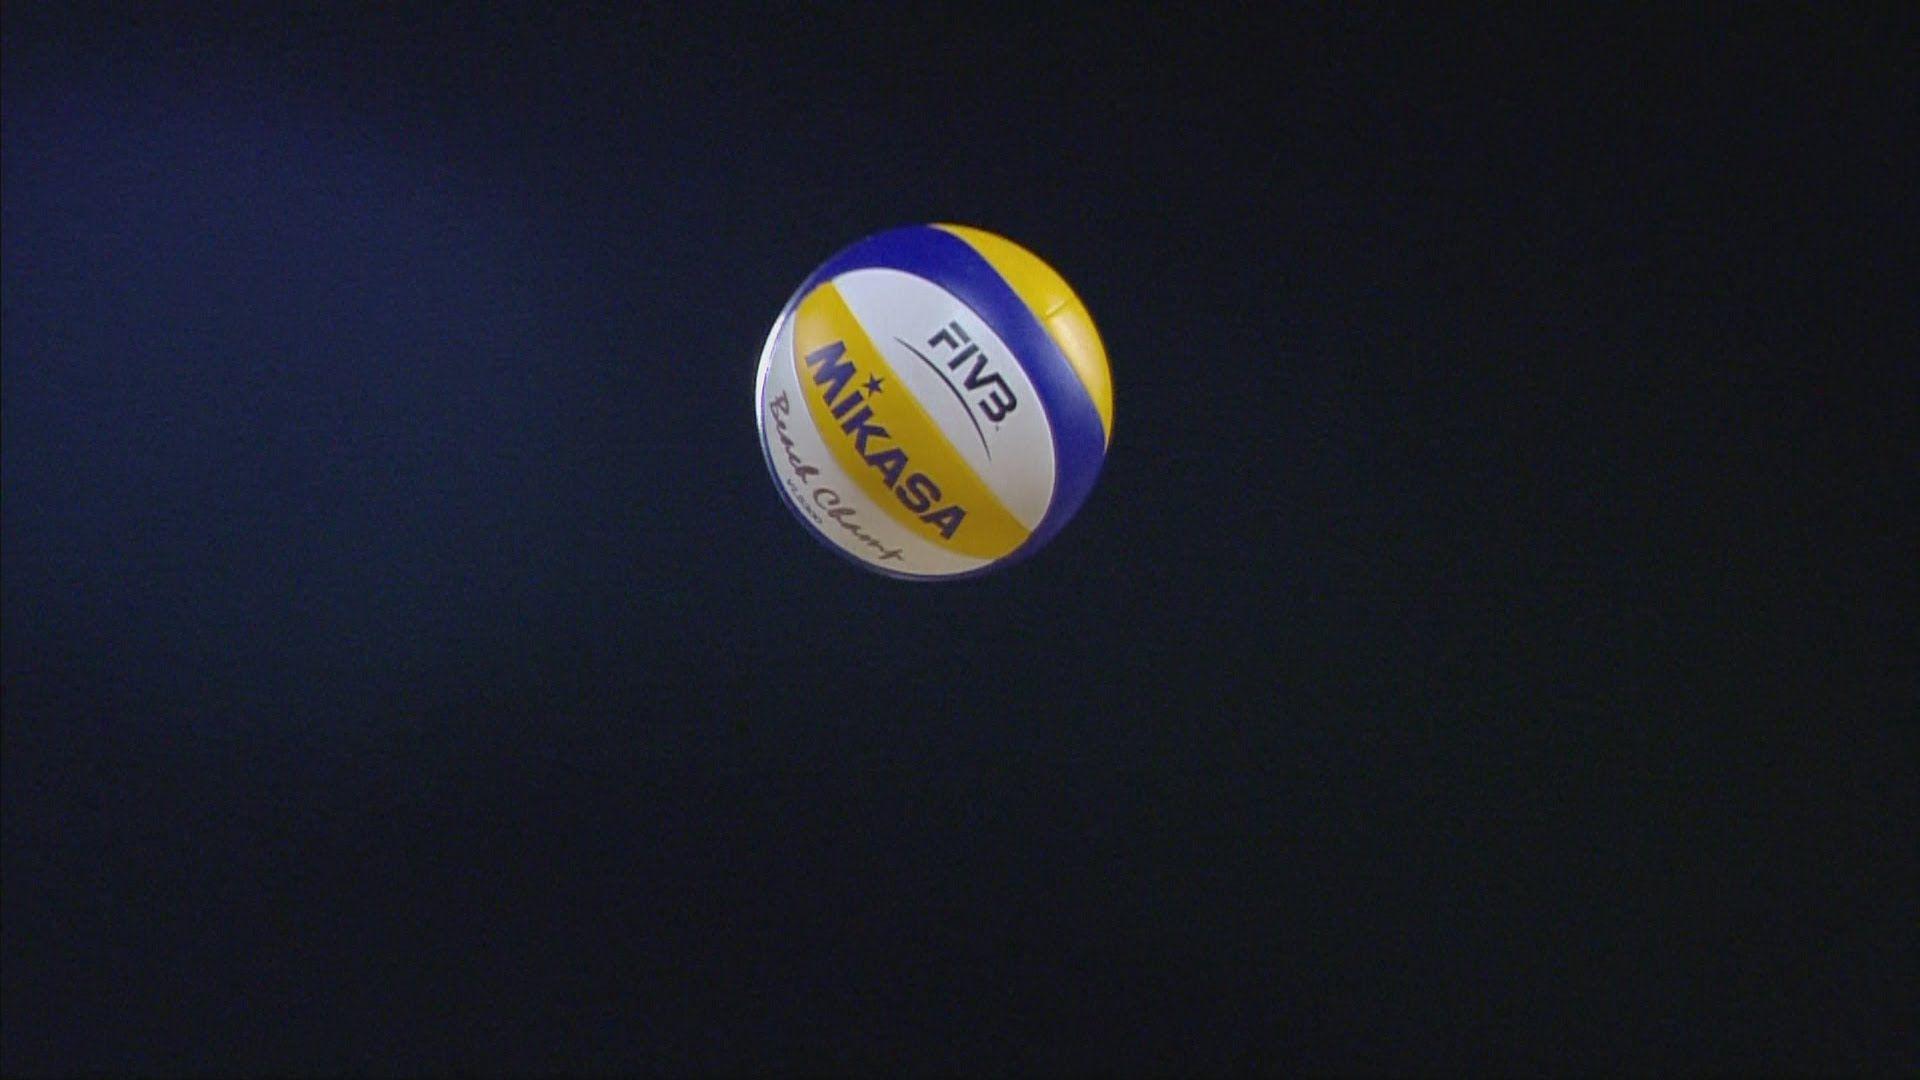 Volleyball Wallpaper Ball Volleyball Wallpaper Volleyball Backgrounds Volleyball